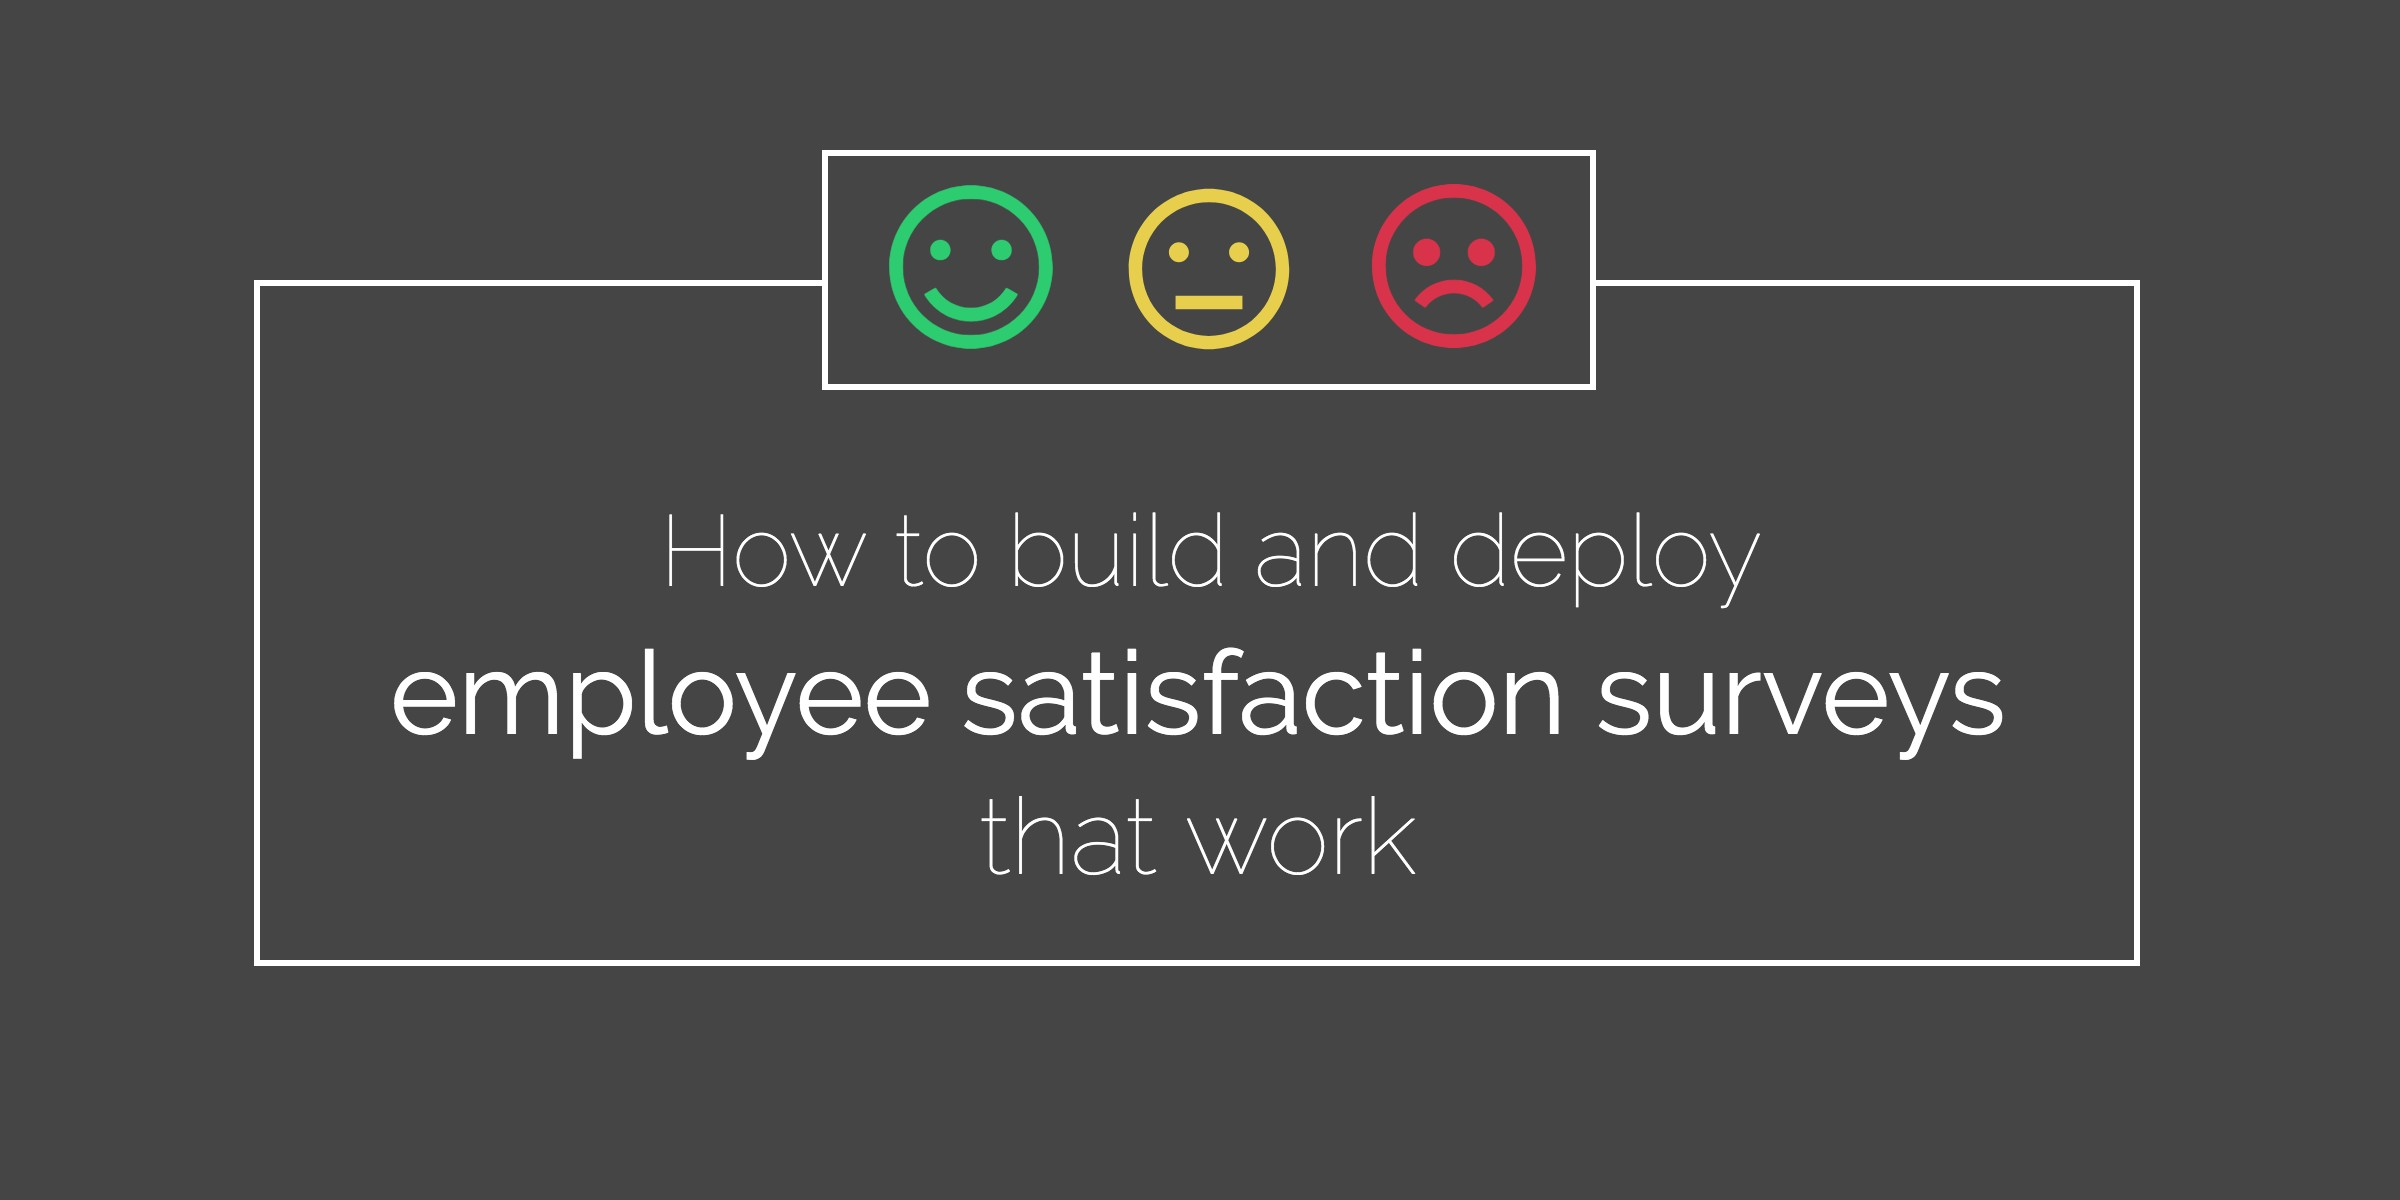 employee-satisfaction-surveys